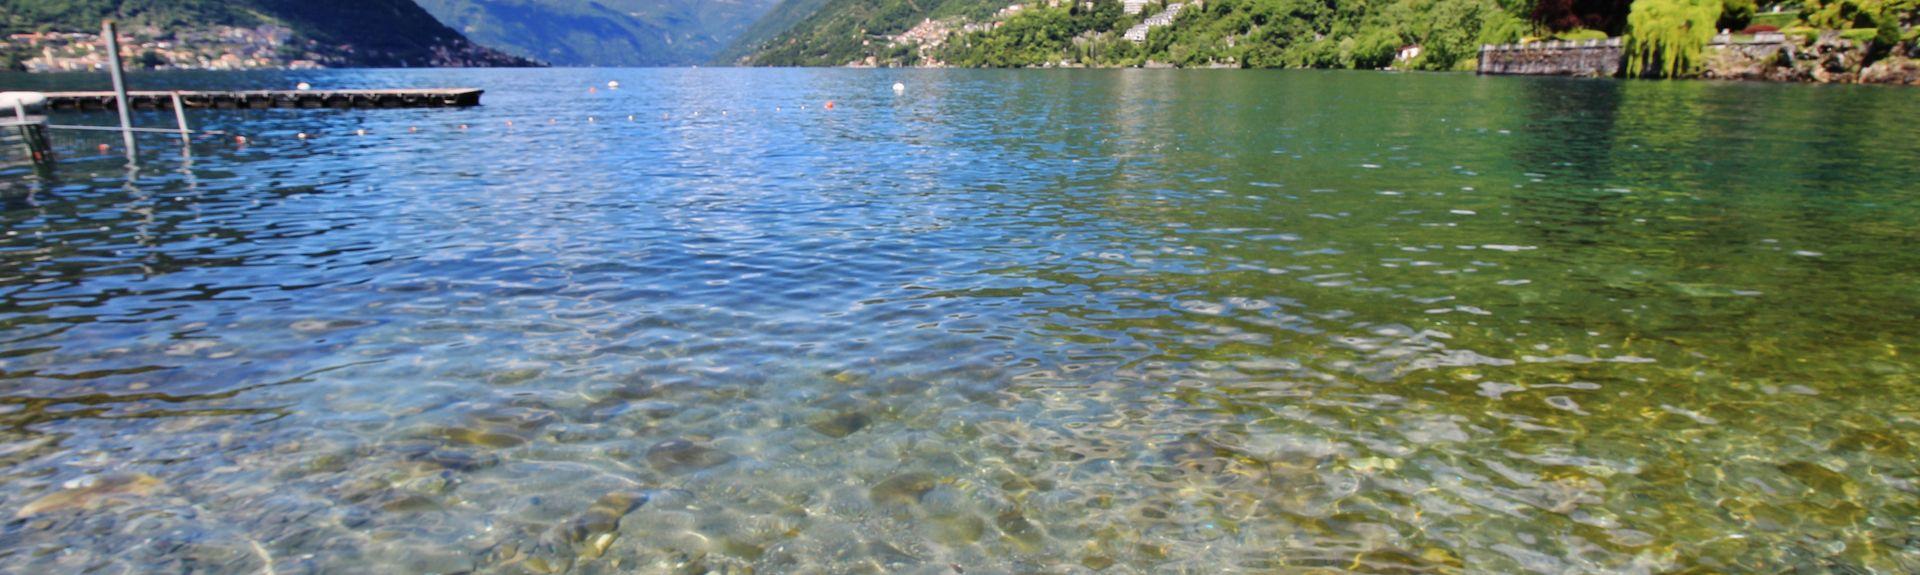 Sirone, Lombardia, Italia